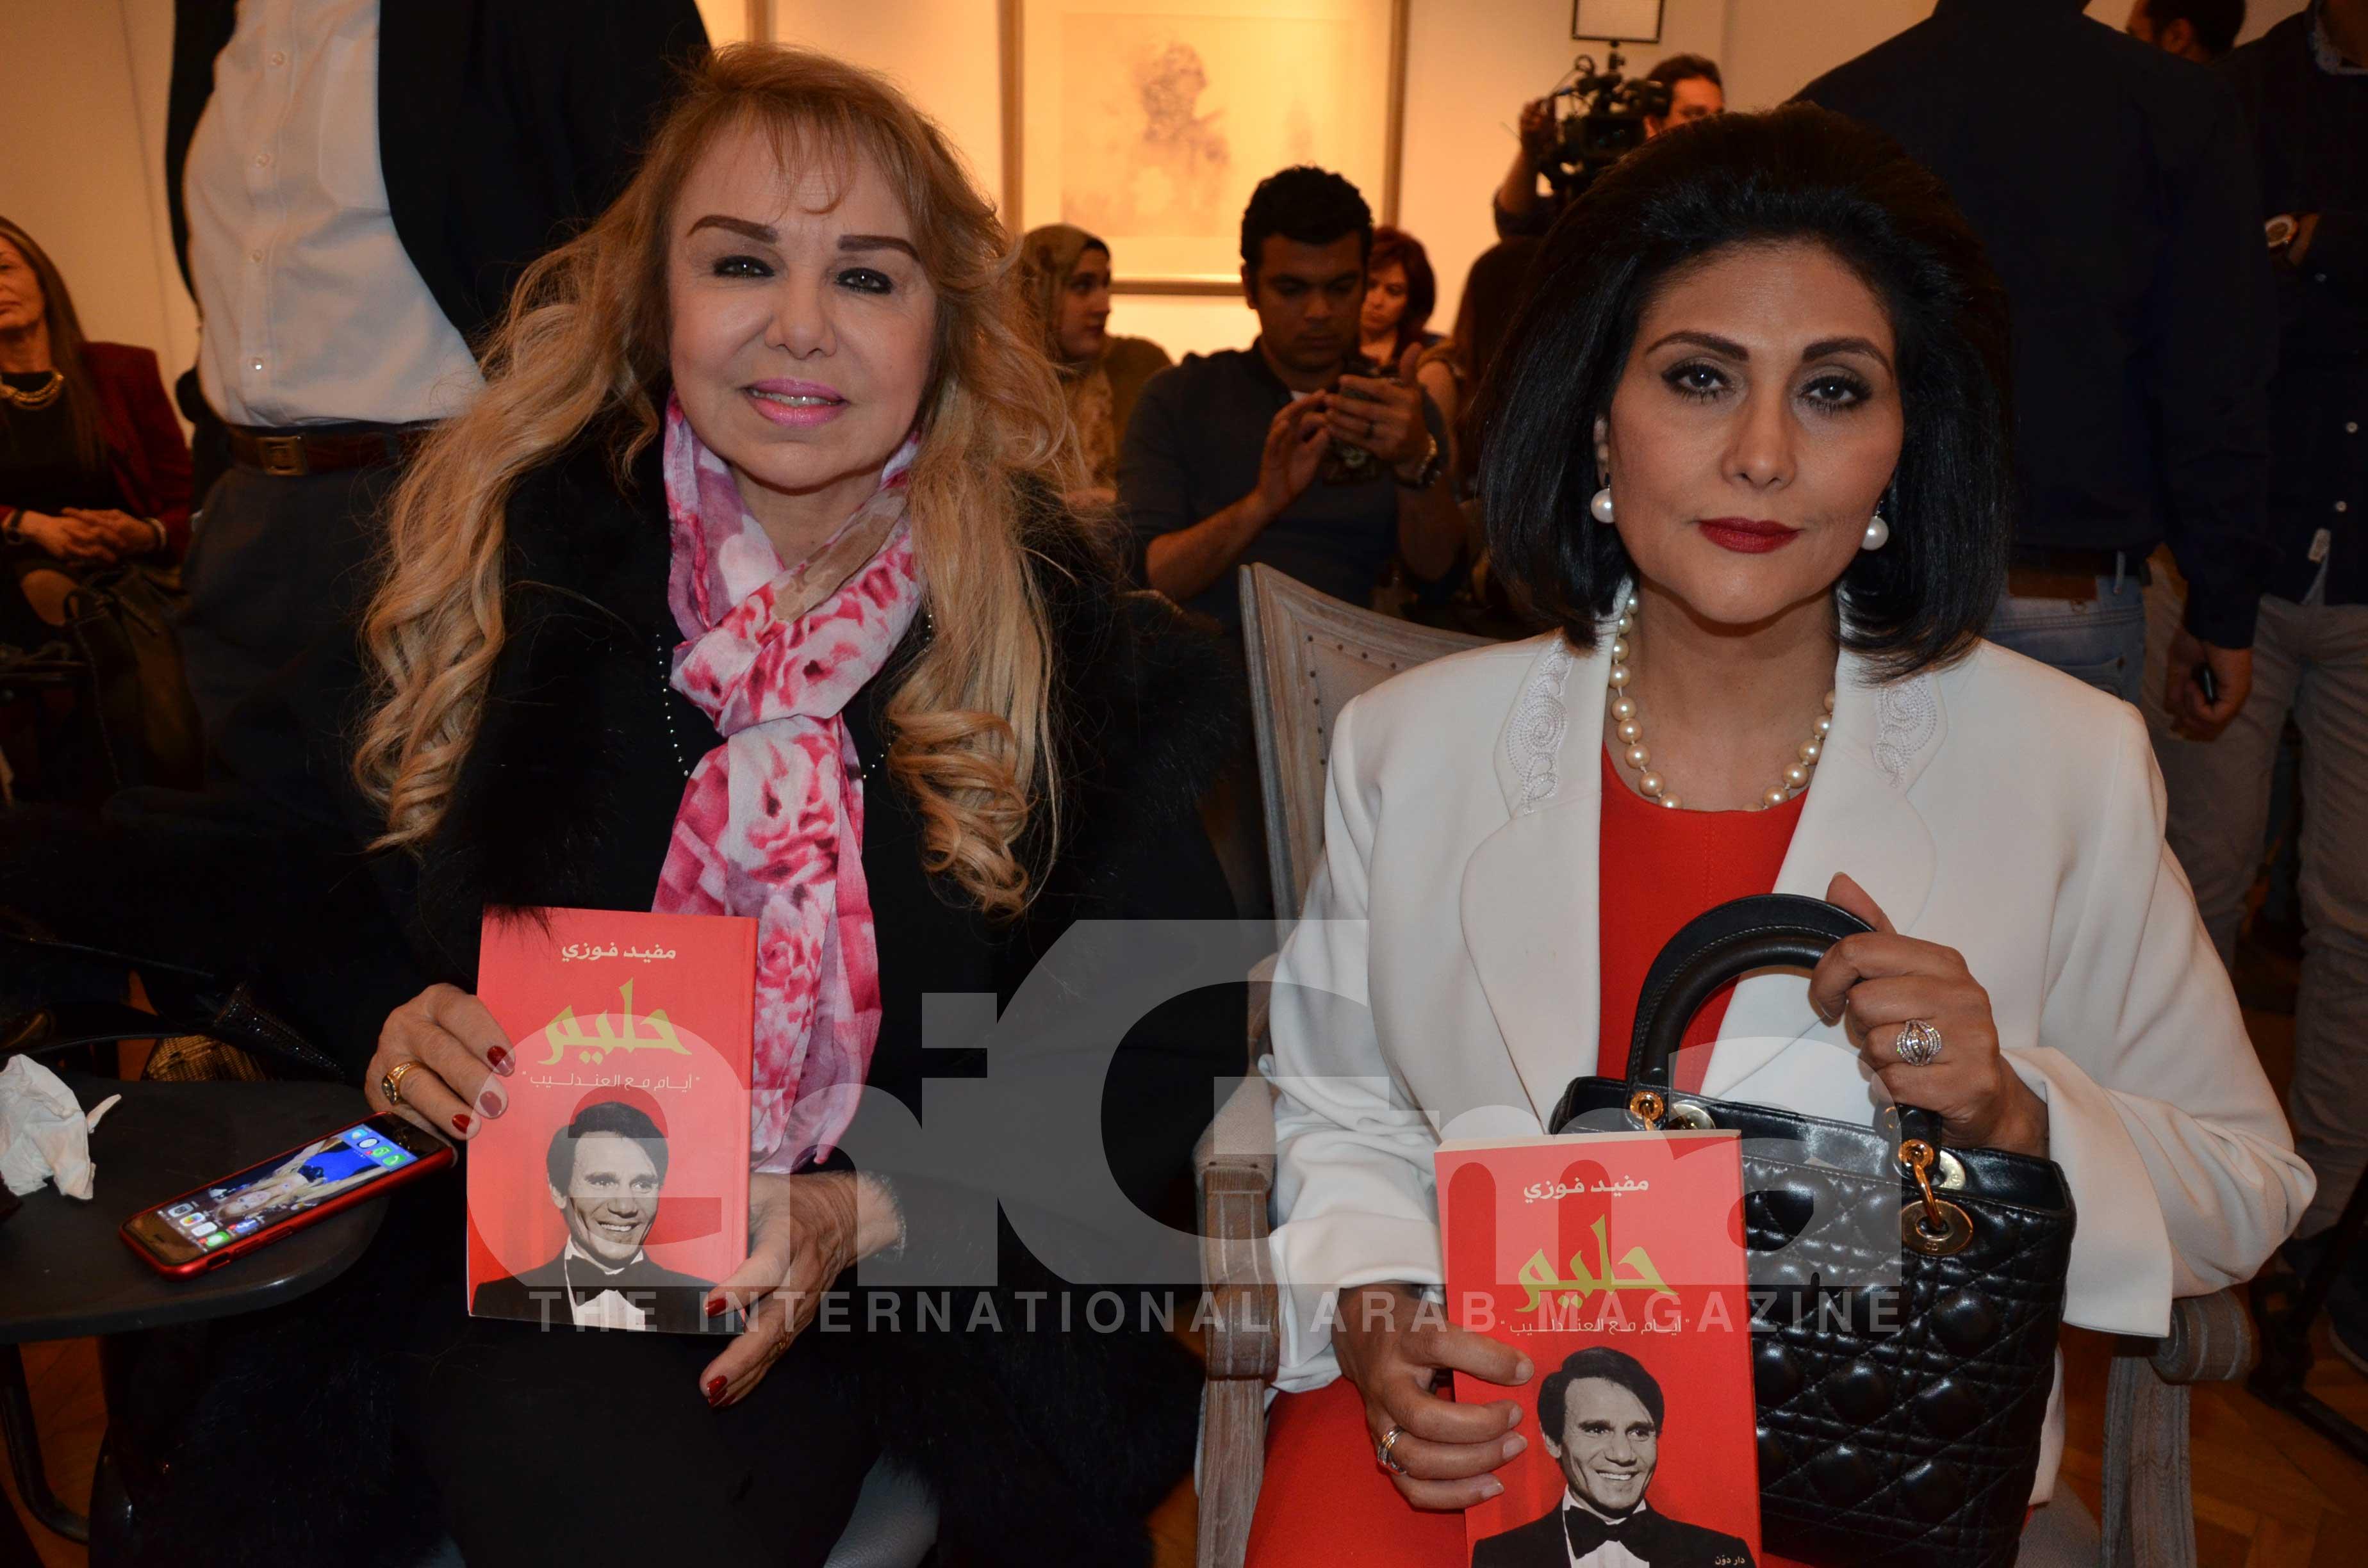 Ms. Soheir Shalaby & Ms. Awatef Serag Eldin